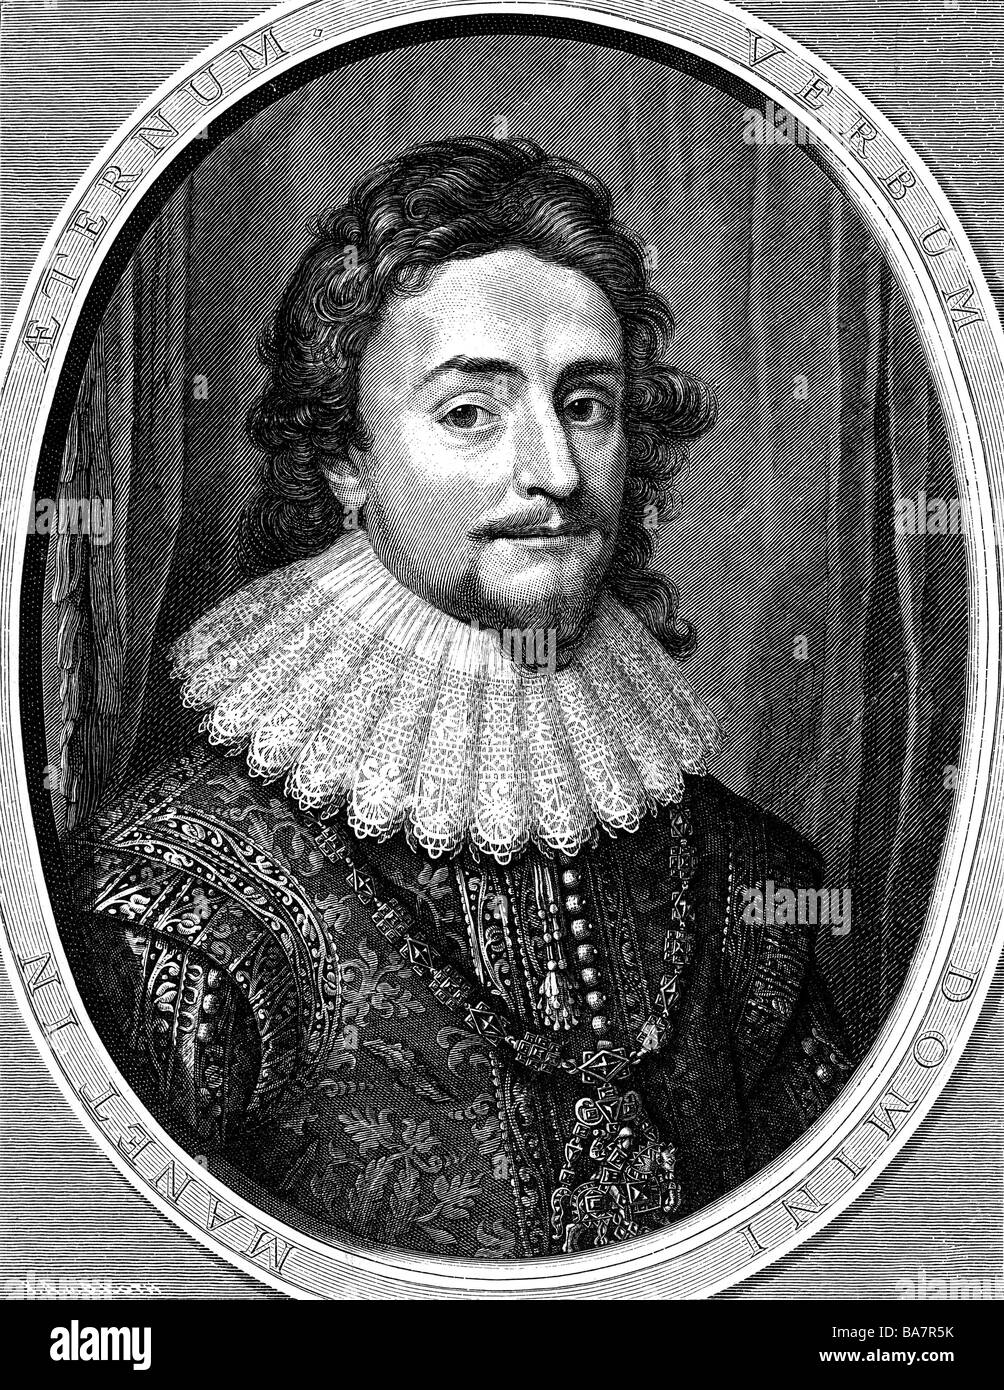 Frederick V, 16.8.1596 - 21.9.1632, Elector Palatinate 19.9.1610 - 23.2.1623 and King of Bohemia 25.10.1619 - 9.11.1620, Stock Photo